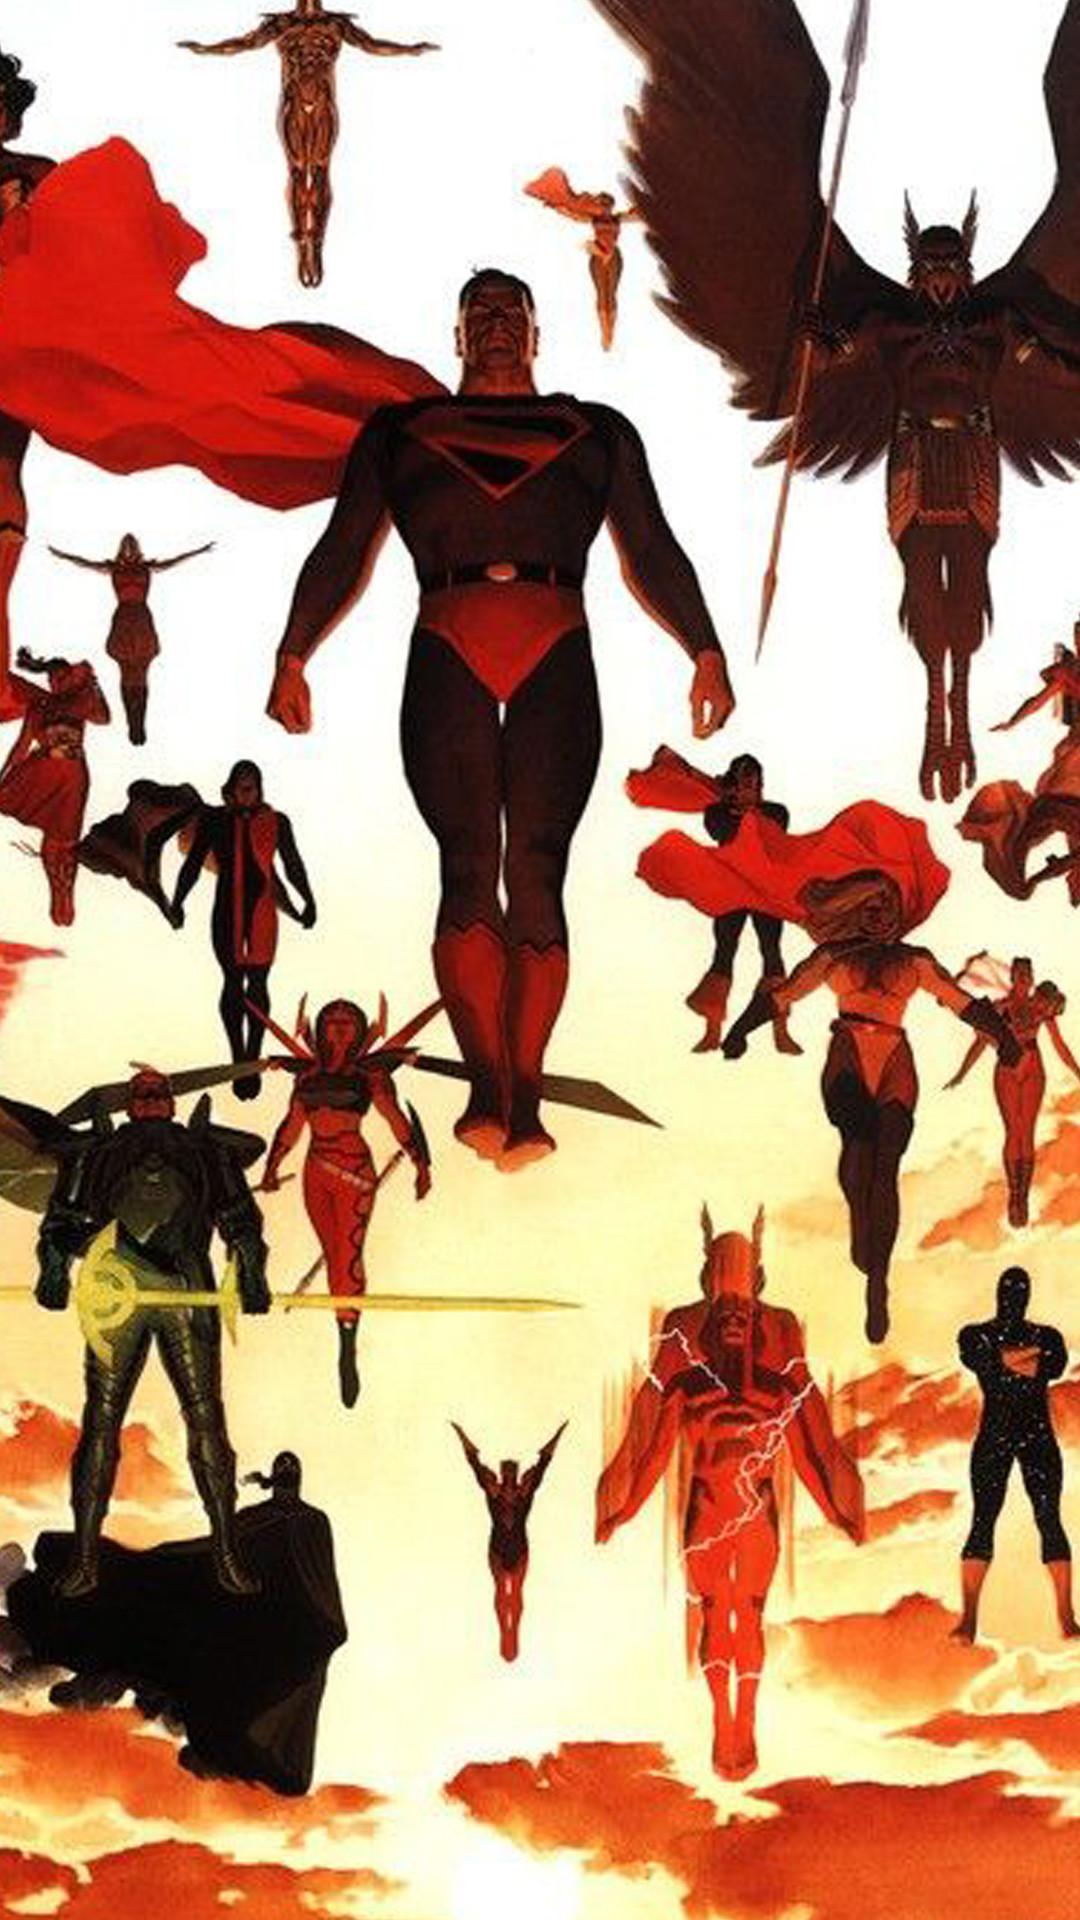 1920x1080 Justice League Movie Wallpaper HD 24466